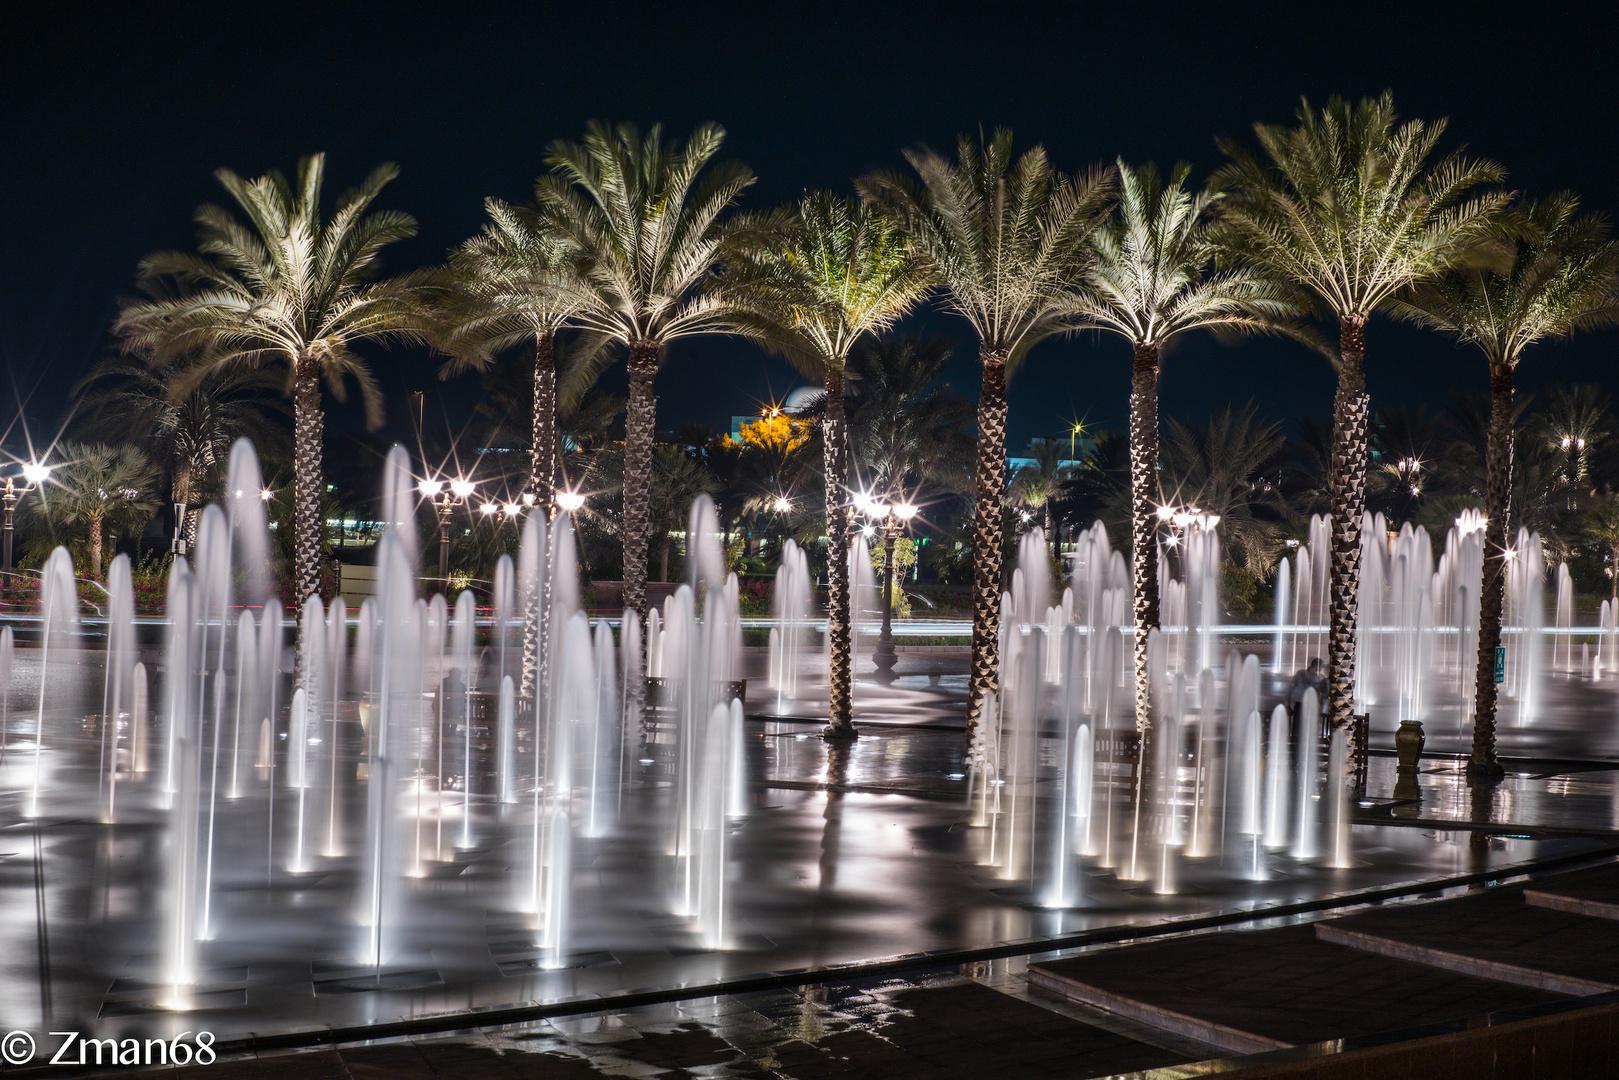 Emirates Palace Hotel Fountain